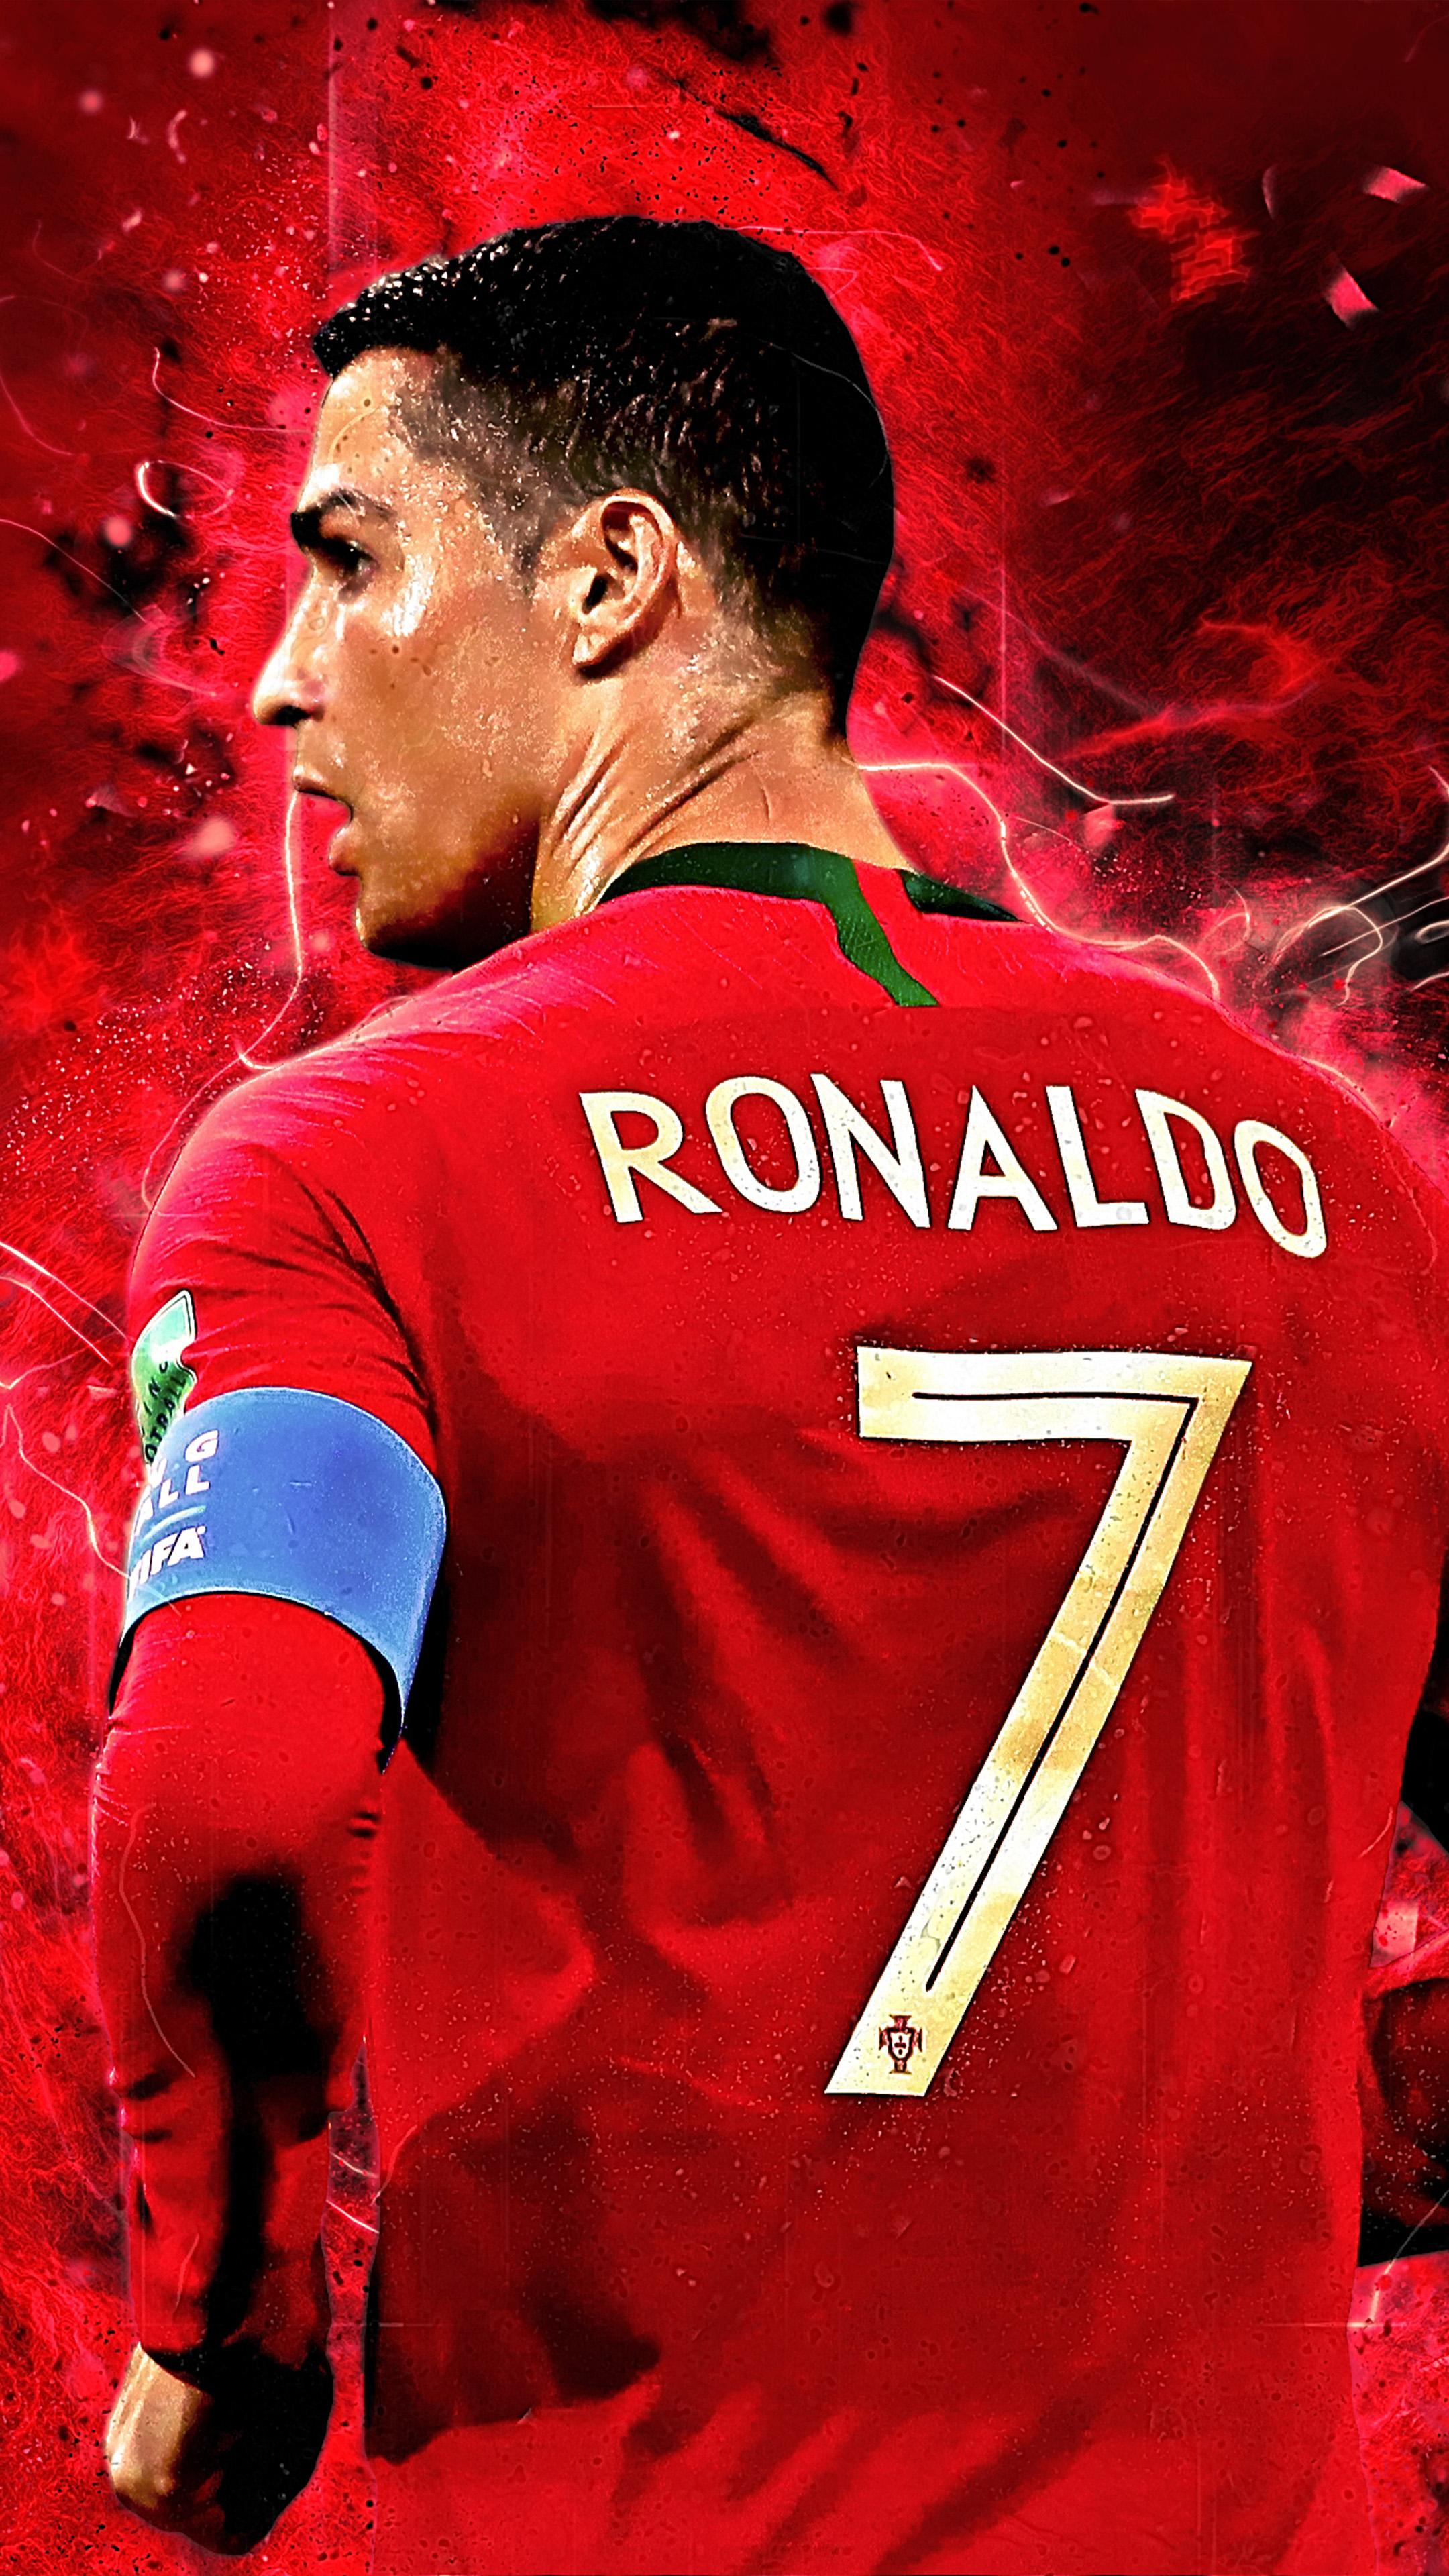 Cristiano Ronaldo Jersey Number 7 4K Ultra HD Mobile Wallpaper 2160x3840